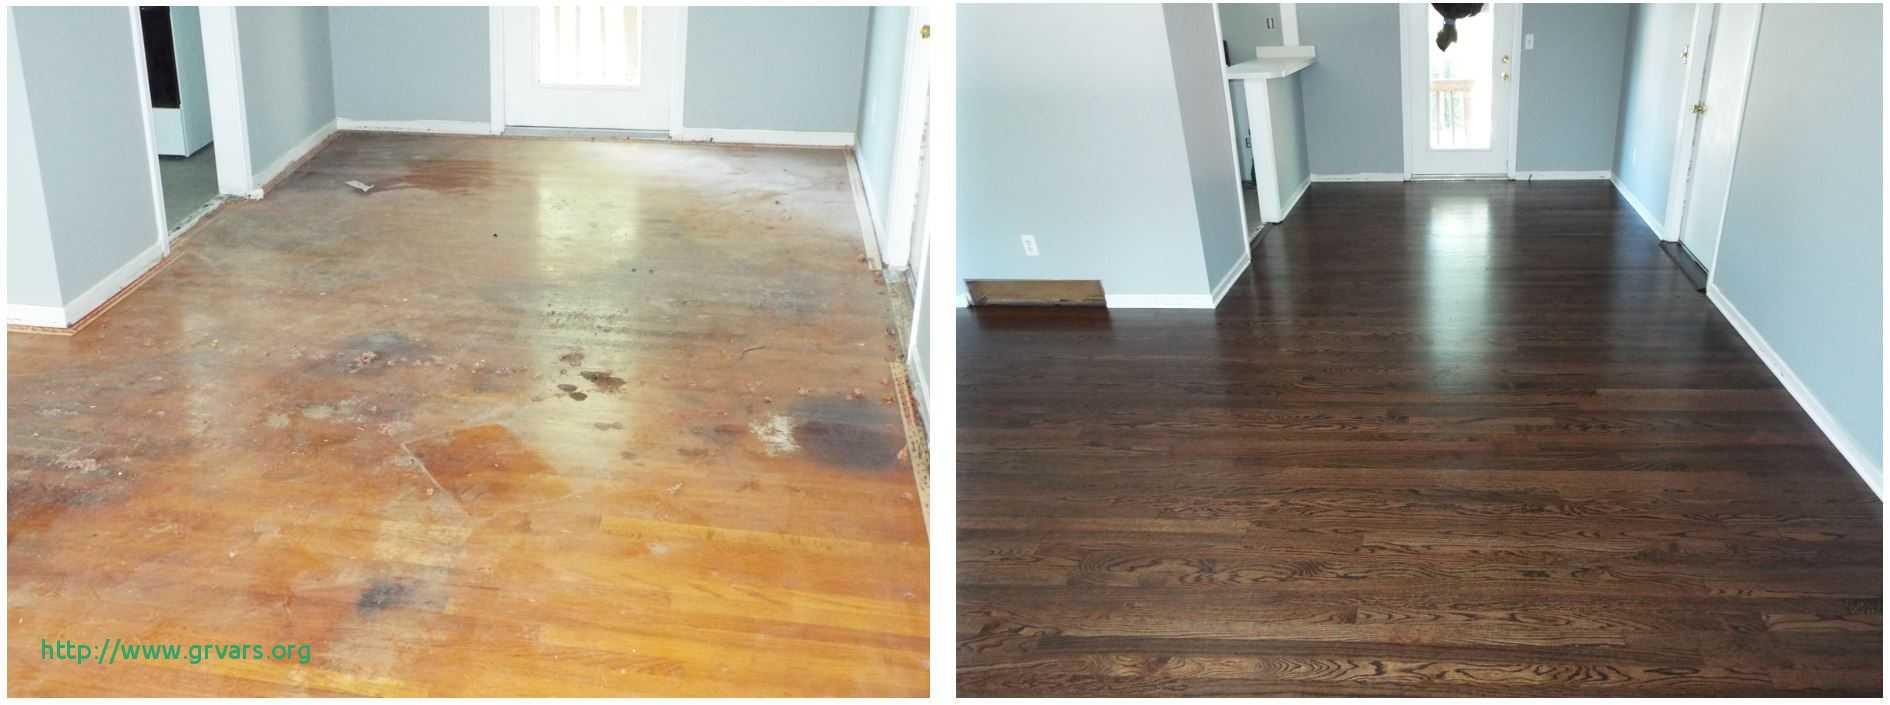 hardwood floor renovation of 17 frais hardwood flooring monmouth county nj ideas blog within hardwood floor refinishing monmouth county nj home